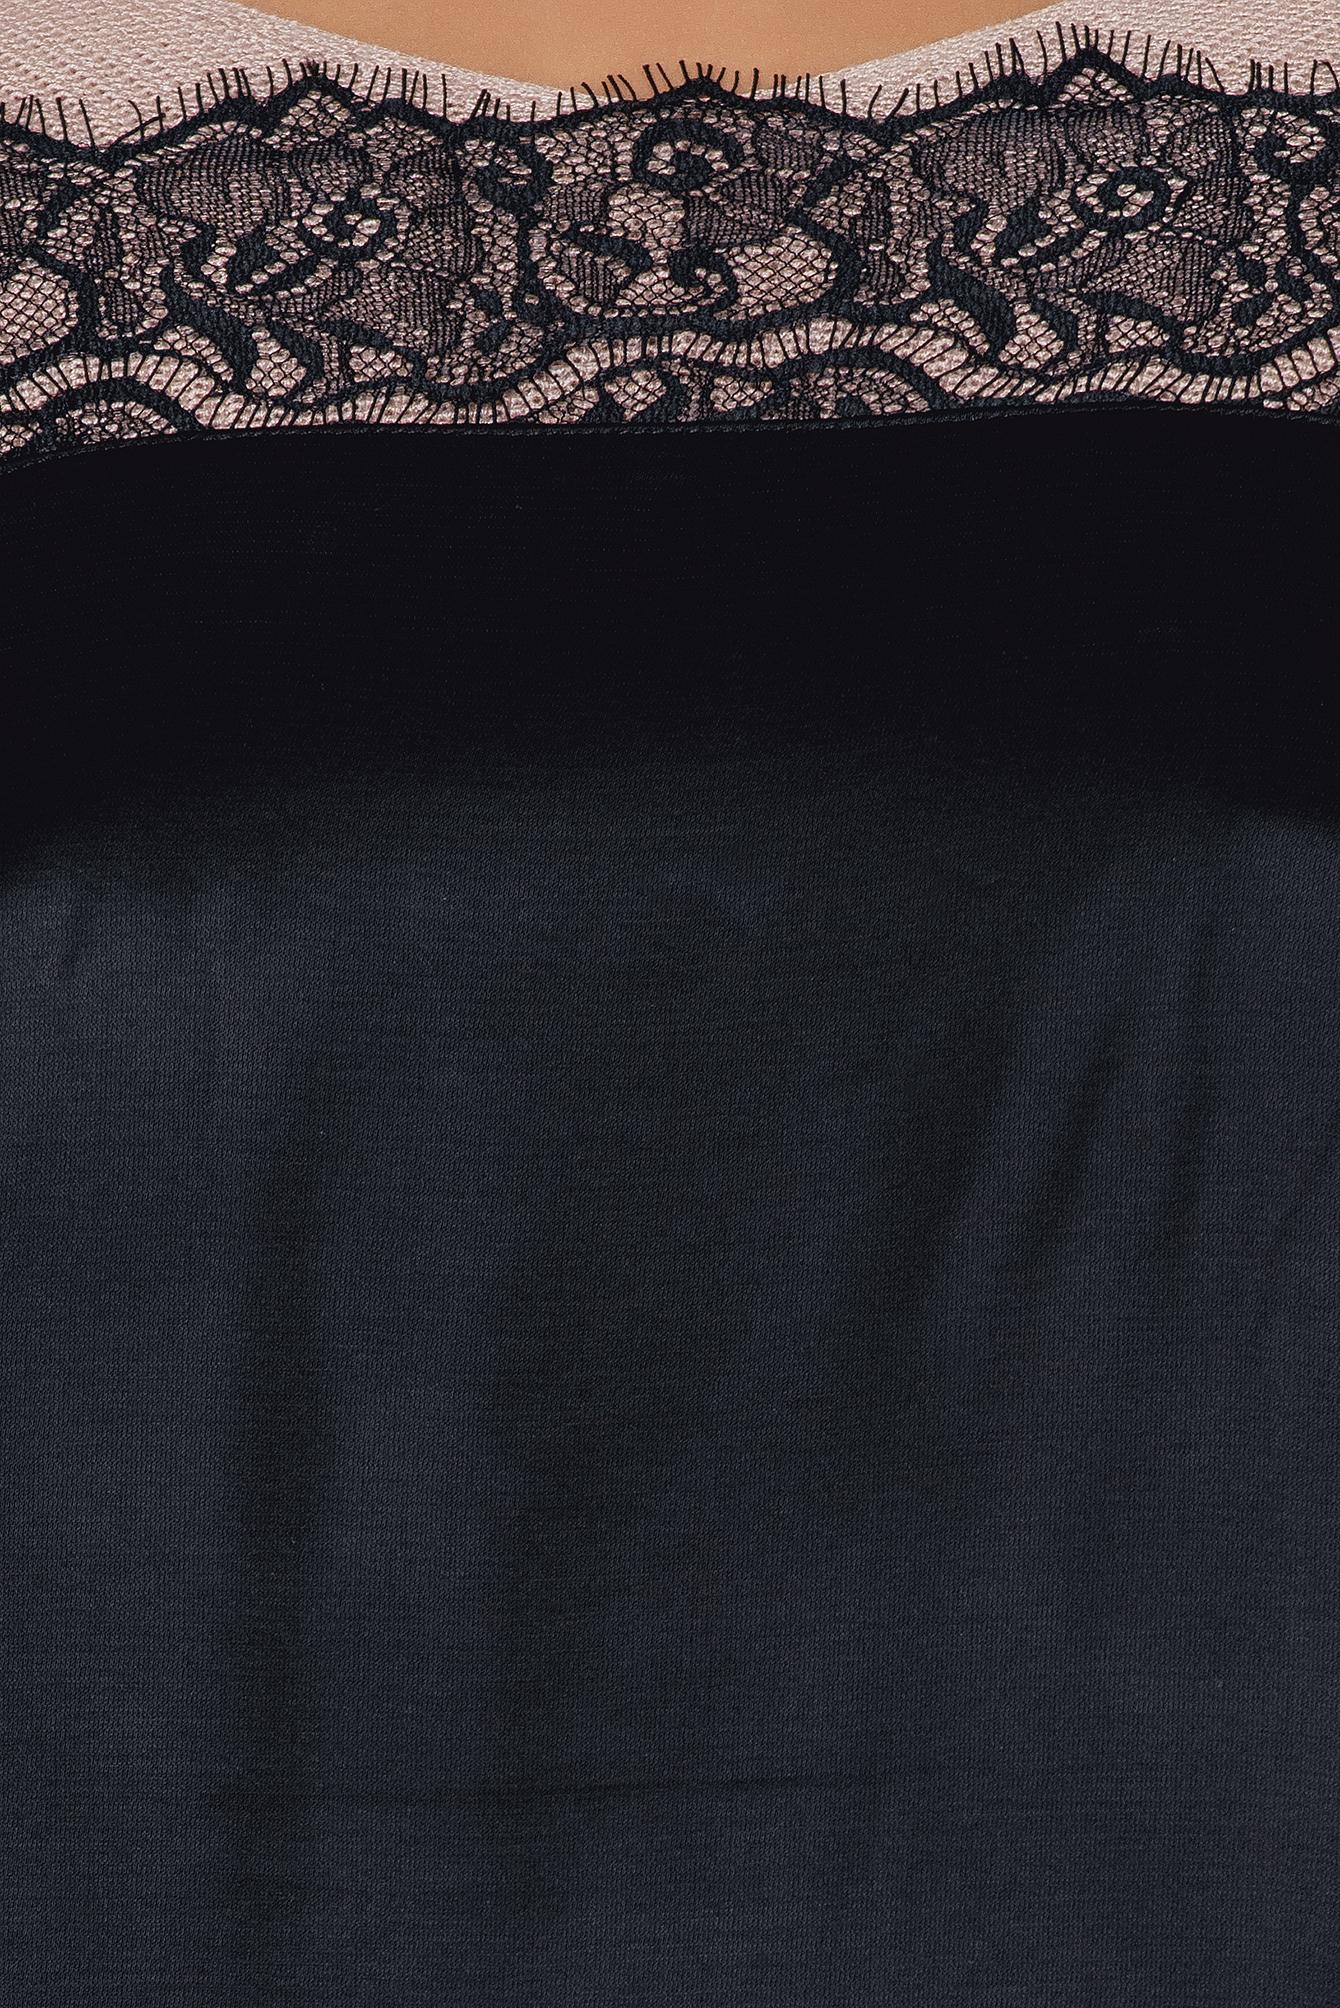 Lace Top Part Slip Dress NA-KD.COM